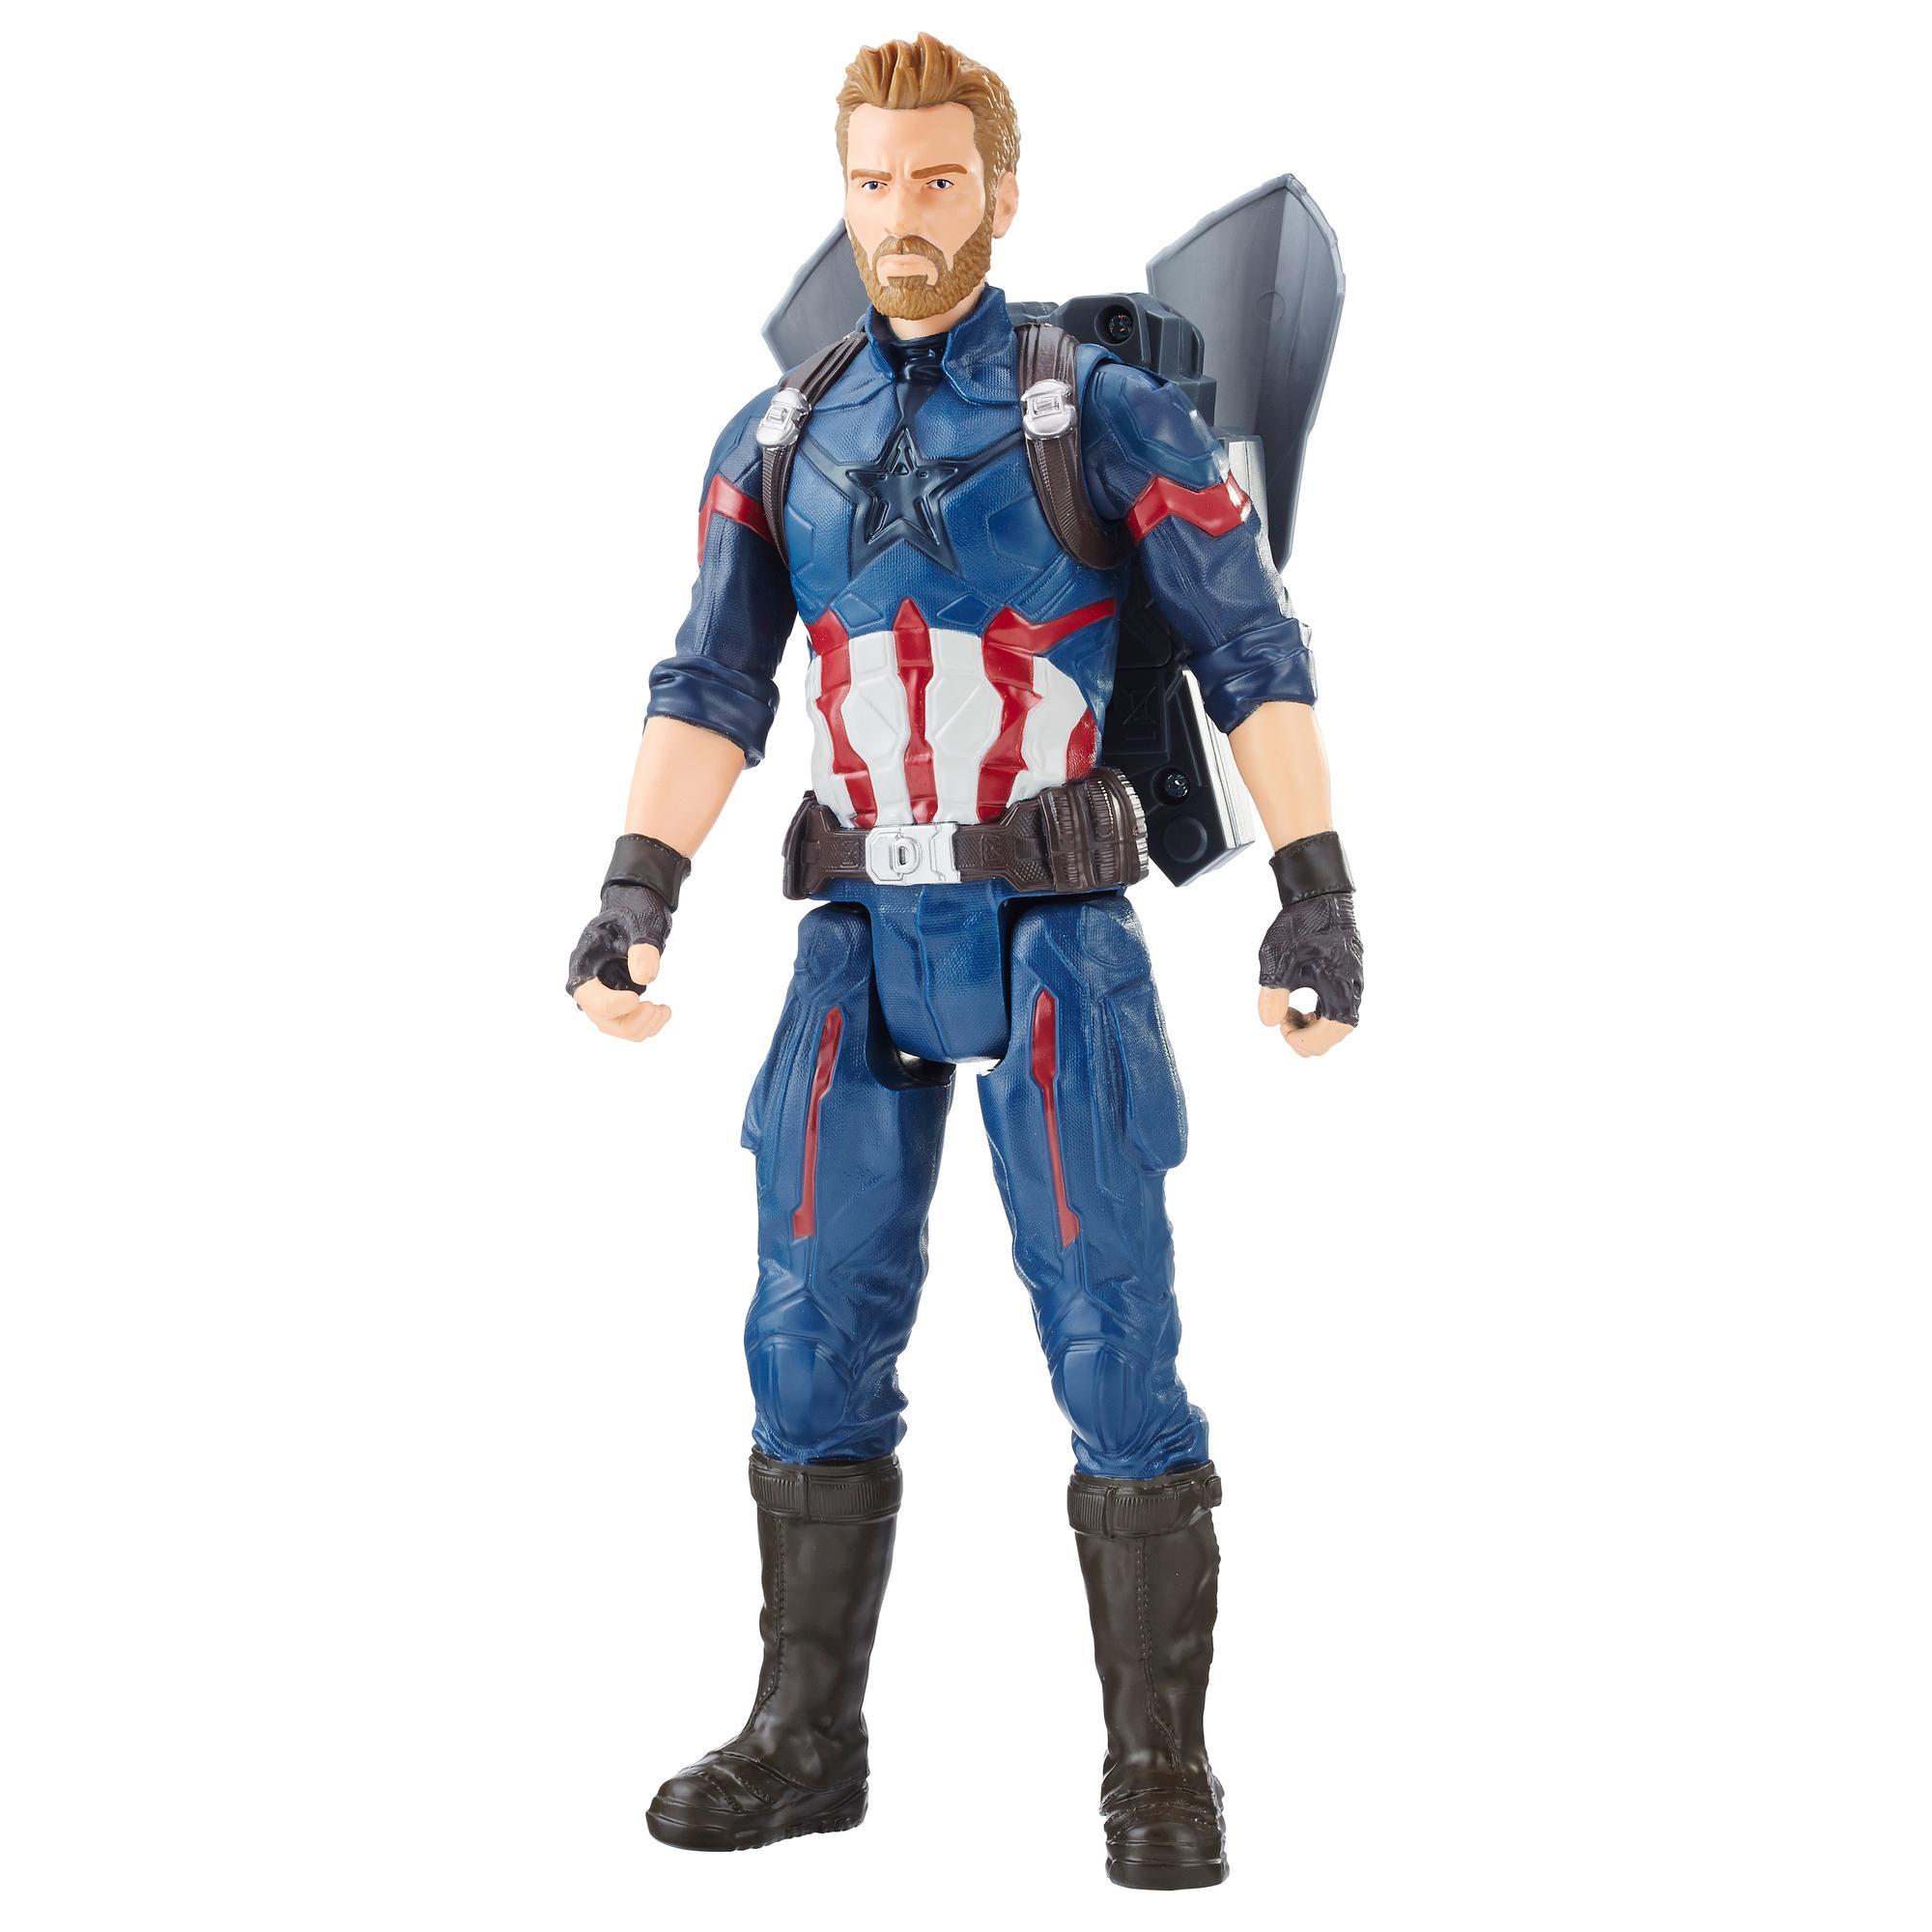 Avengers: Infinity War - Captain America Titan Hero Power FX (Personaggio 30cm, Action Figure)